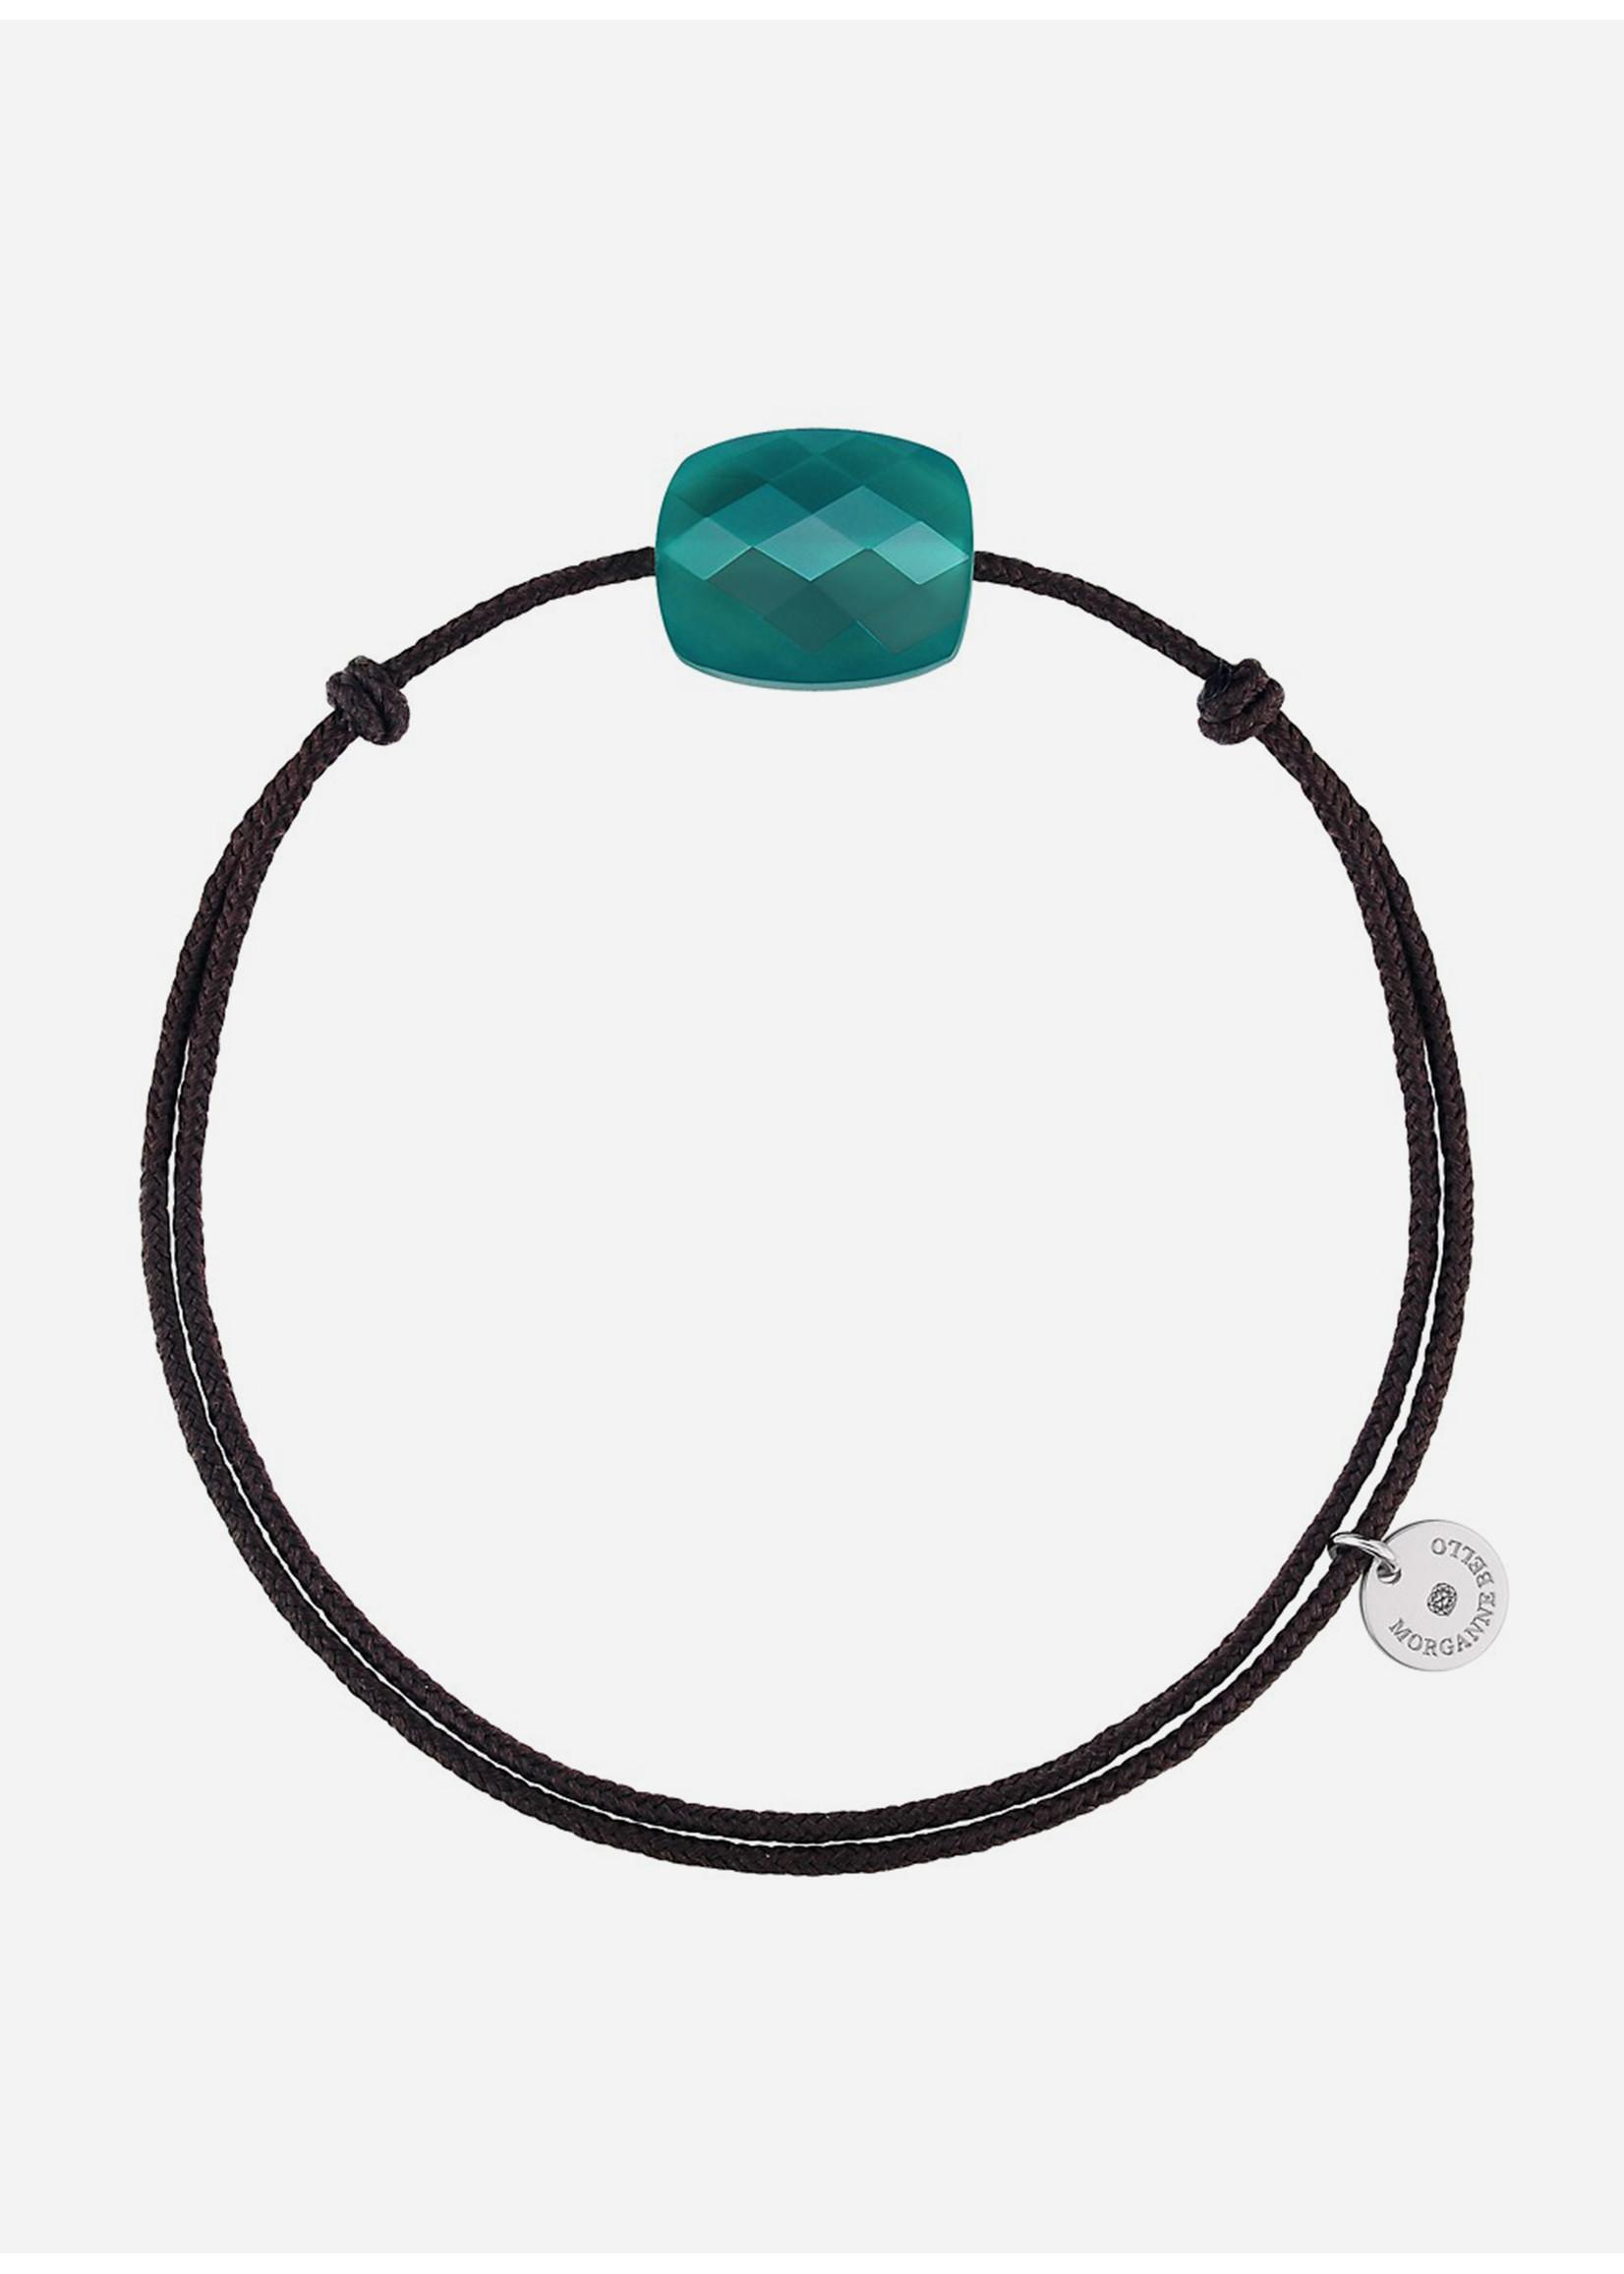 Morganne Bello Cushion green agate bracelet